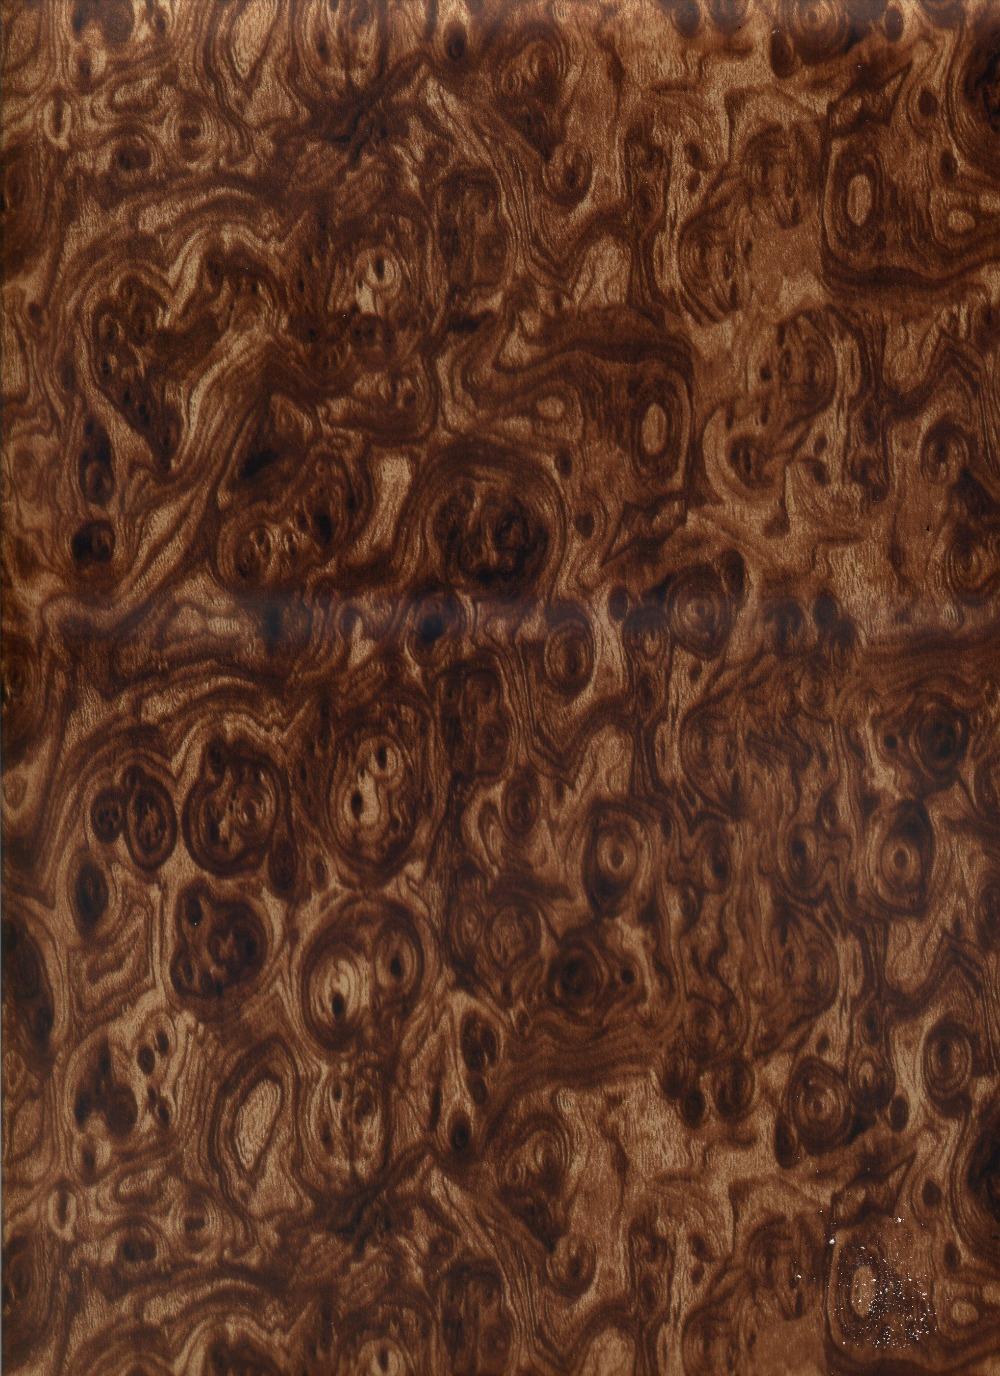 unique walnut burl wood grain Water tranfer Printing,M-1753,Aqua Print for furniture,Lamp bases,Hydrographic FILM(China (Mainland))